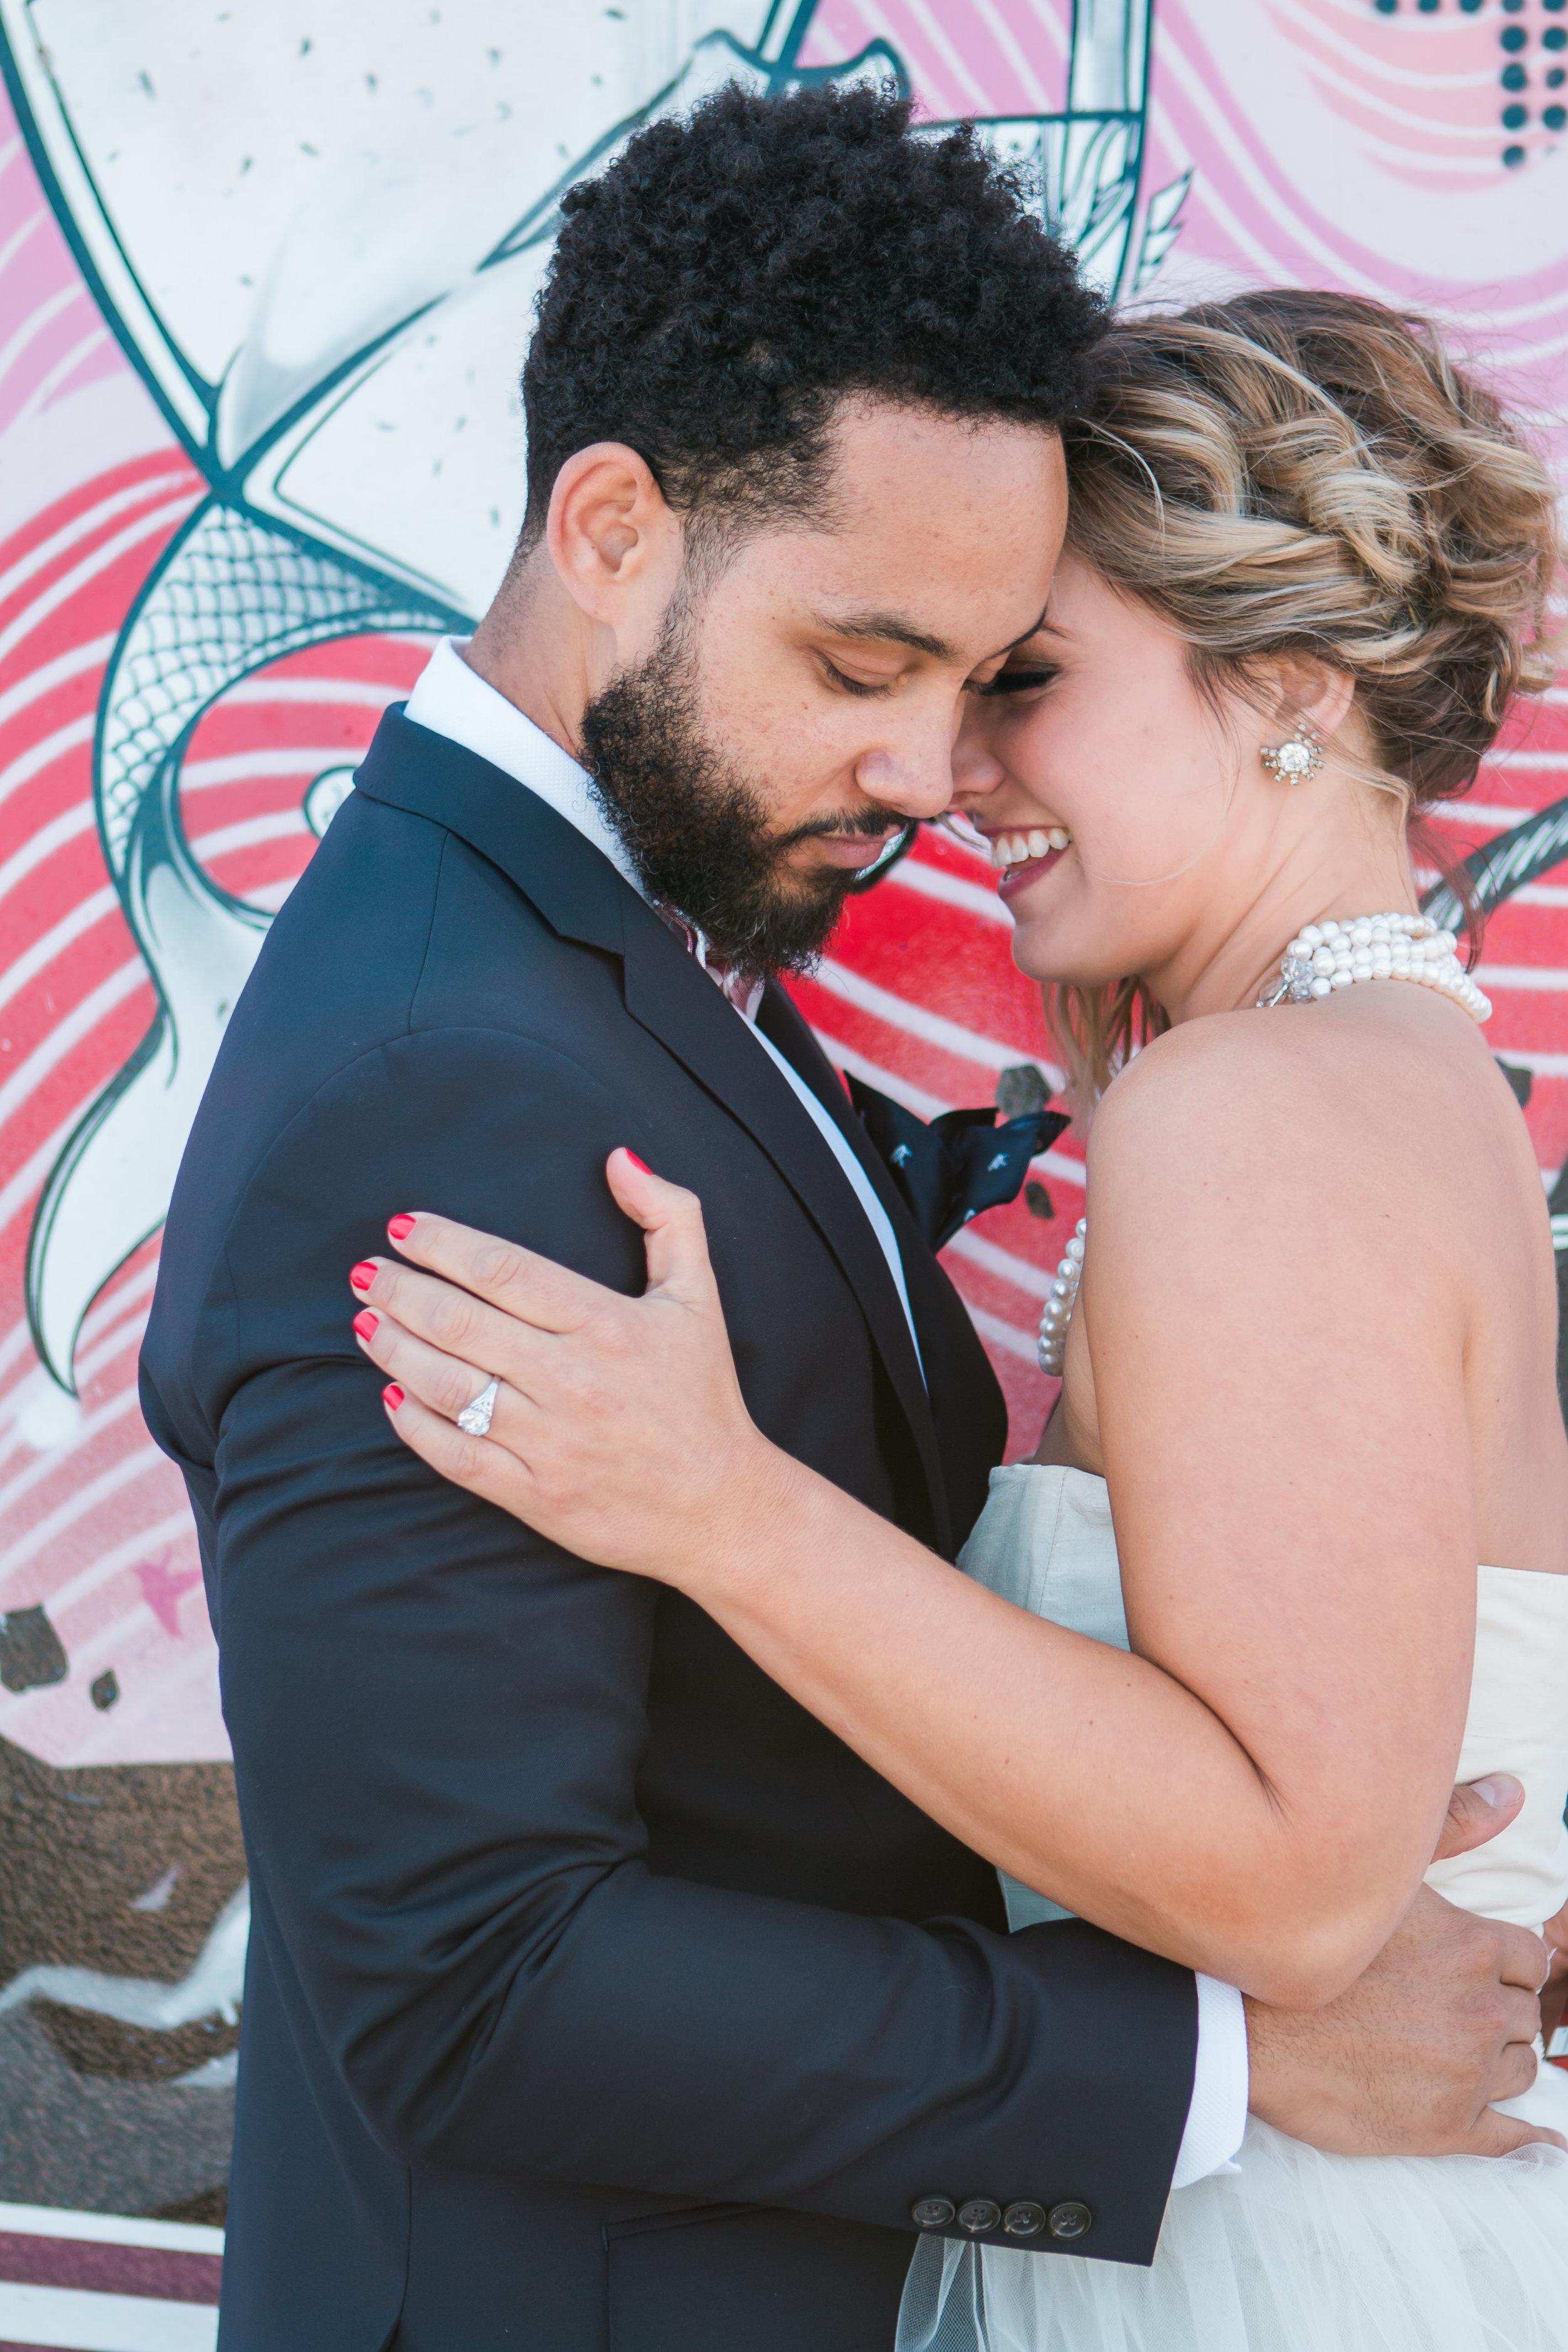 Kate-Alison-Photography-Carnival-Coney-Island-Brooklyn-Wedding-1.JPG